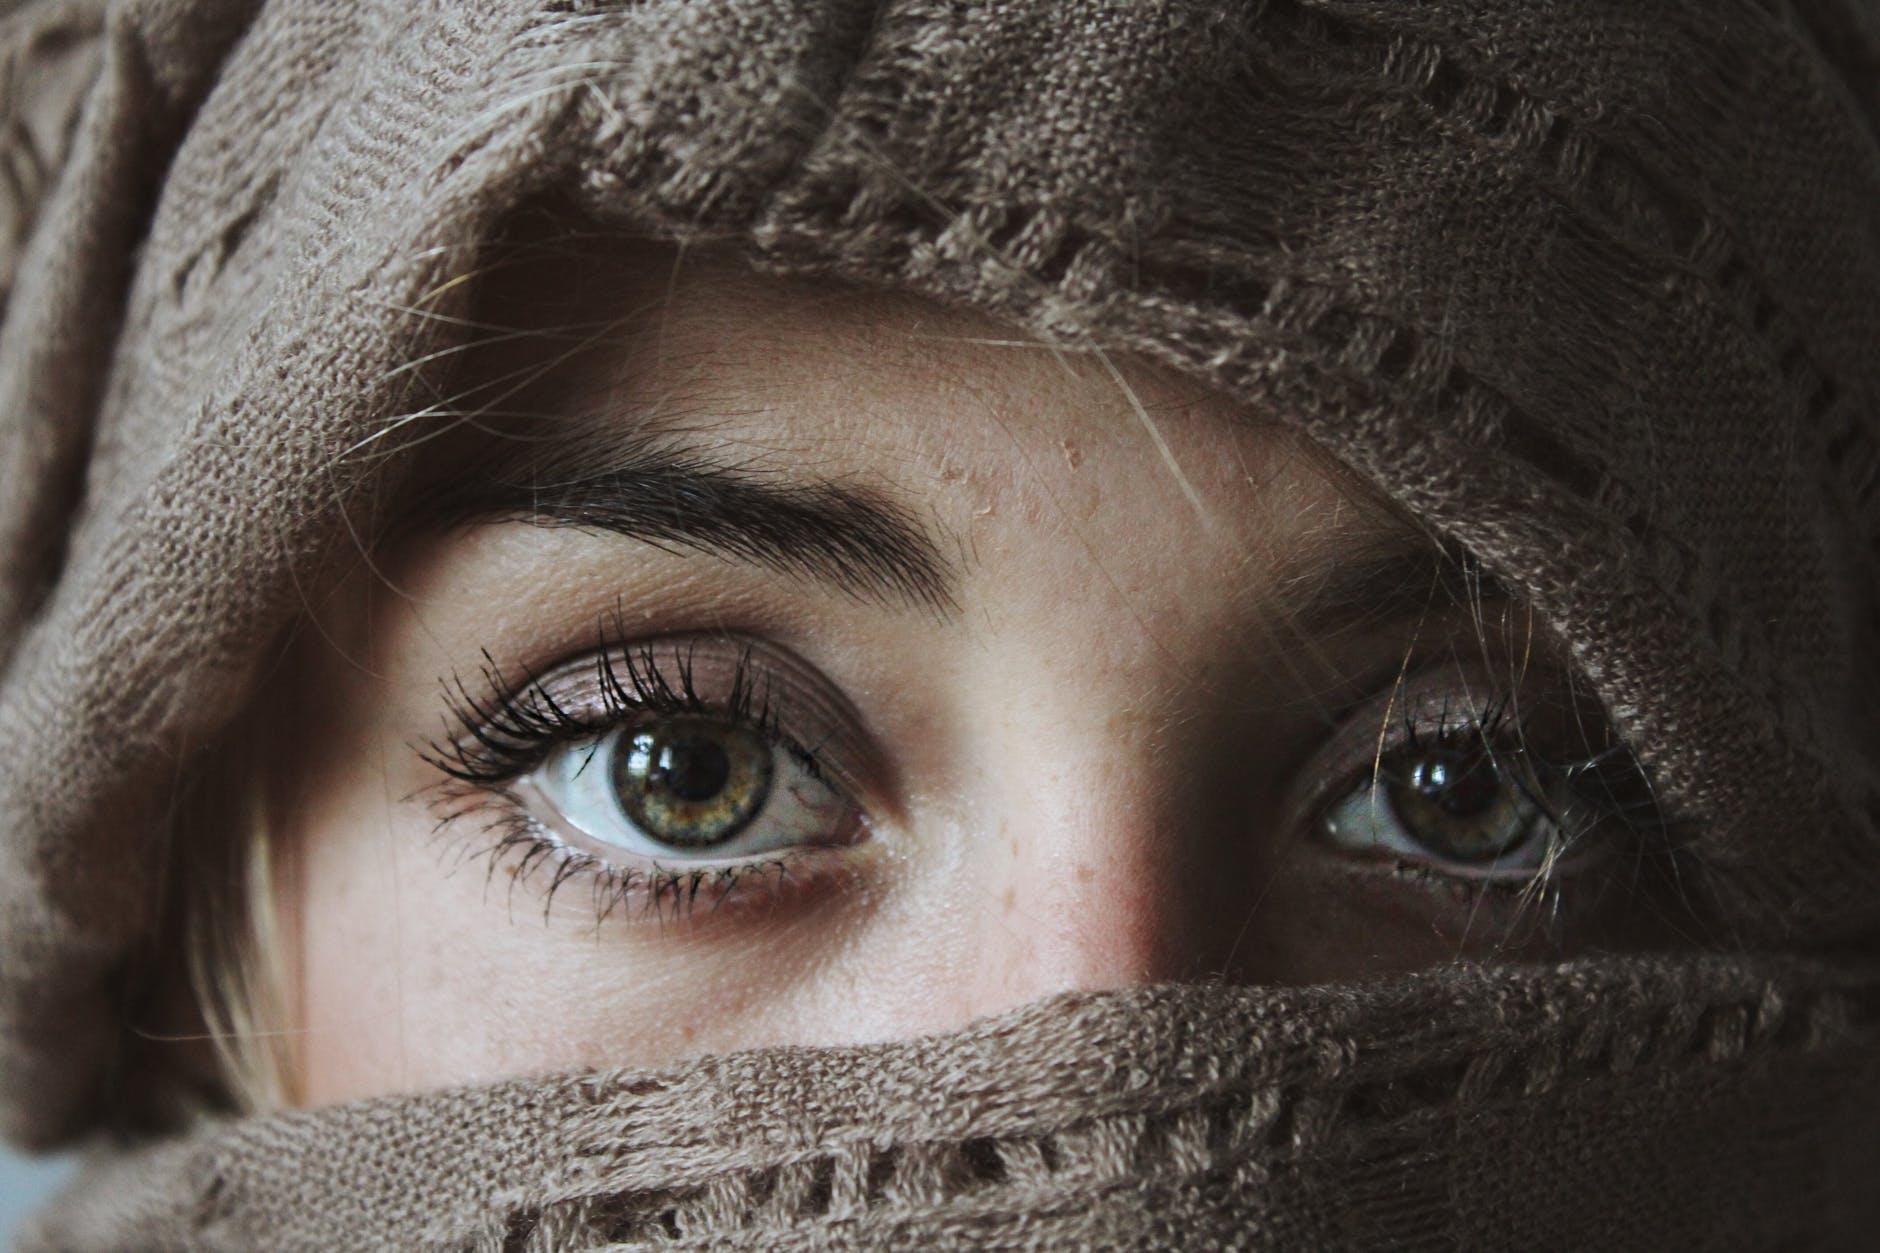 Tẩy trang mắt